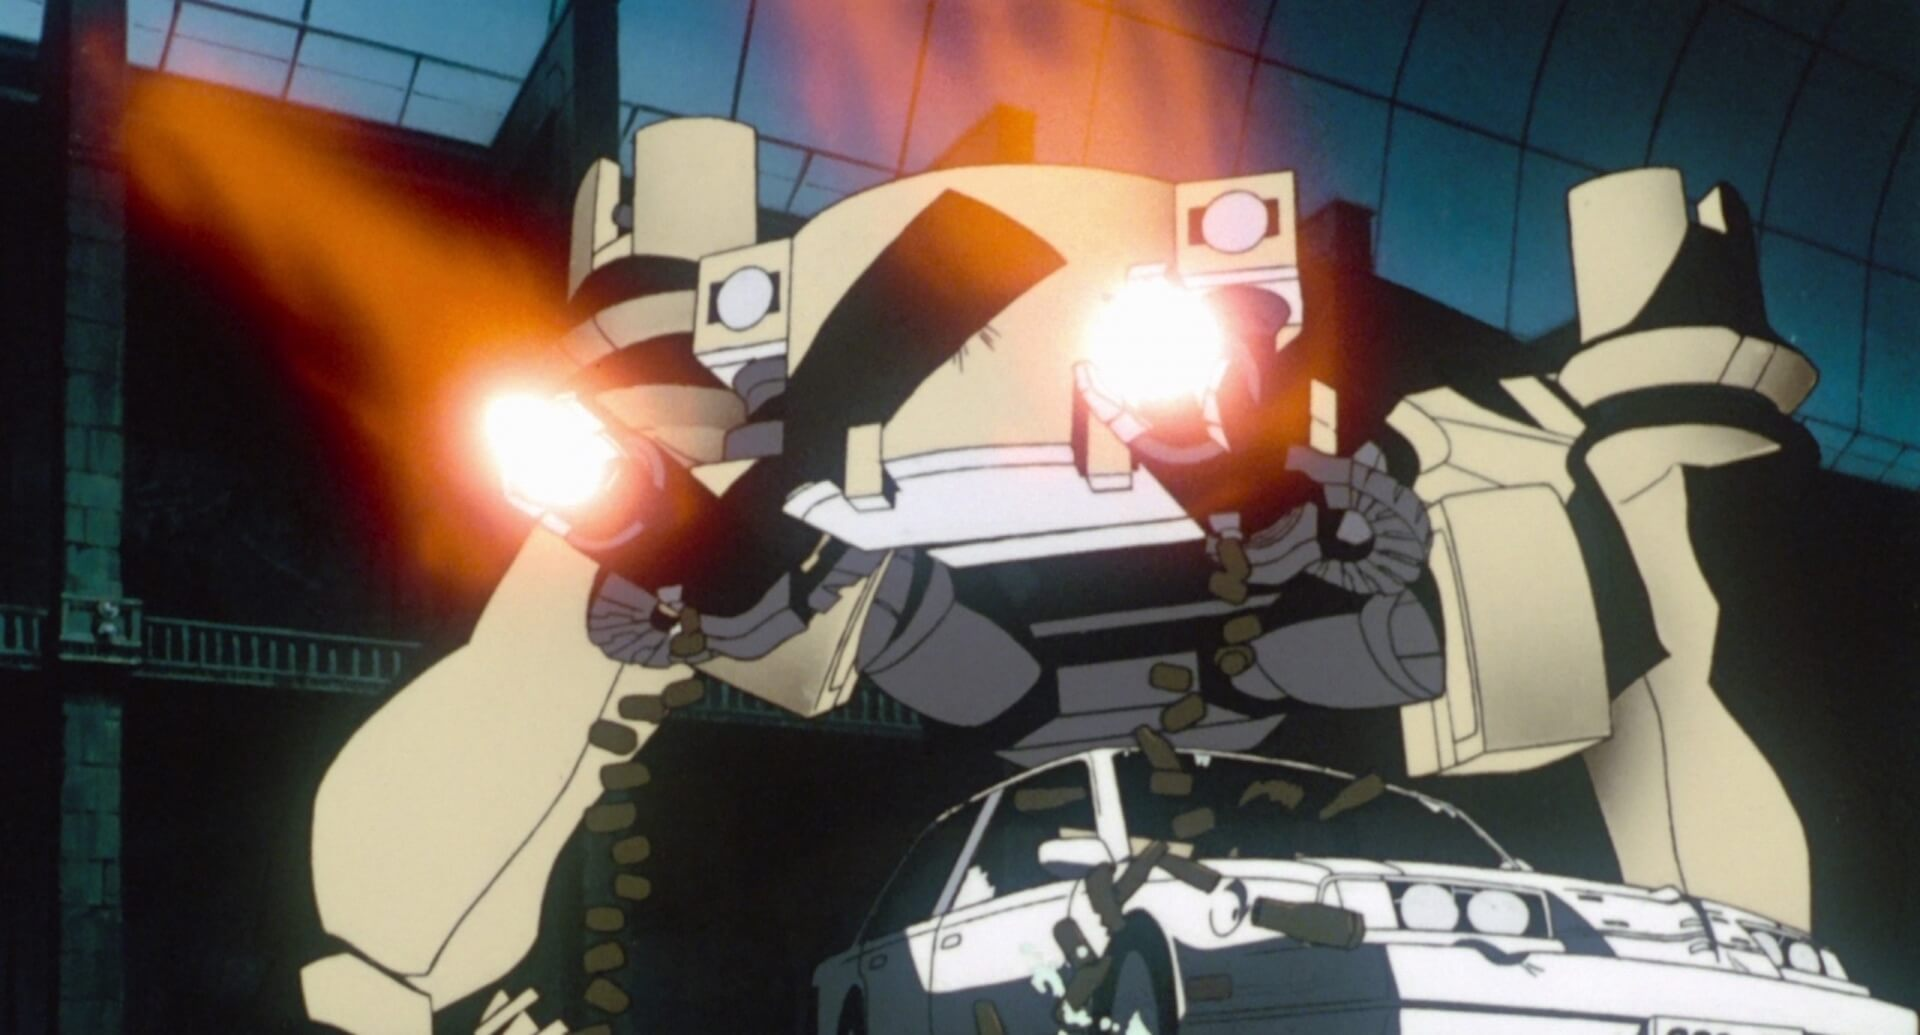 『GHOST IN THE SHELL/攻殻機動隊 4Kリマスター版』がIMAX&通常上映決定!押井守からのコメントも film210820_ghostintheshell_imax_6